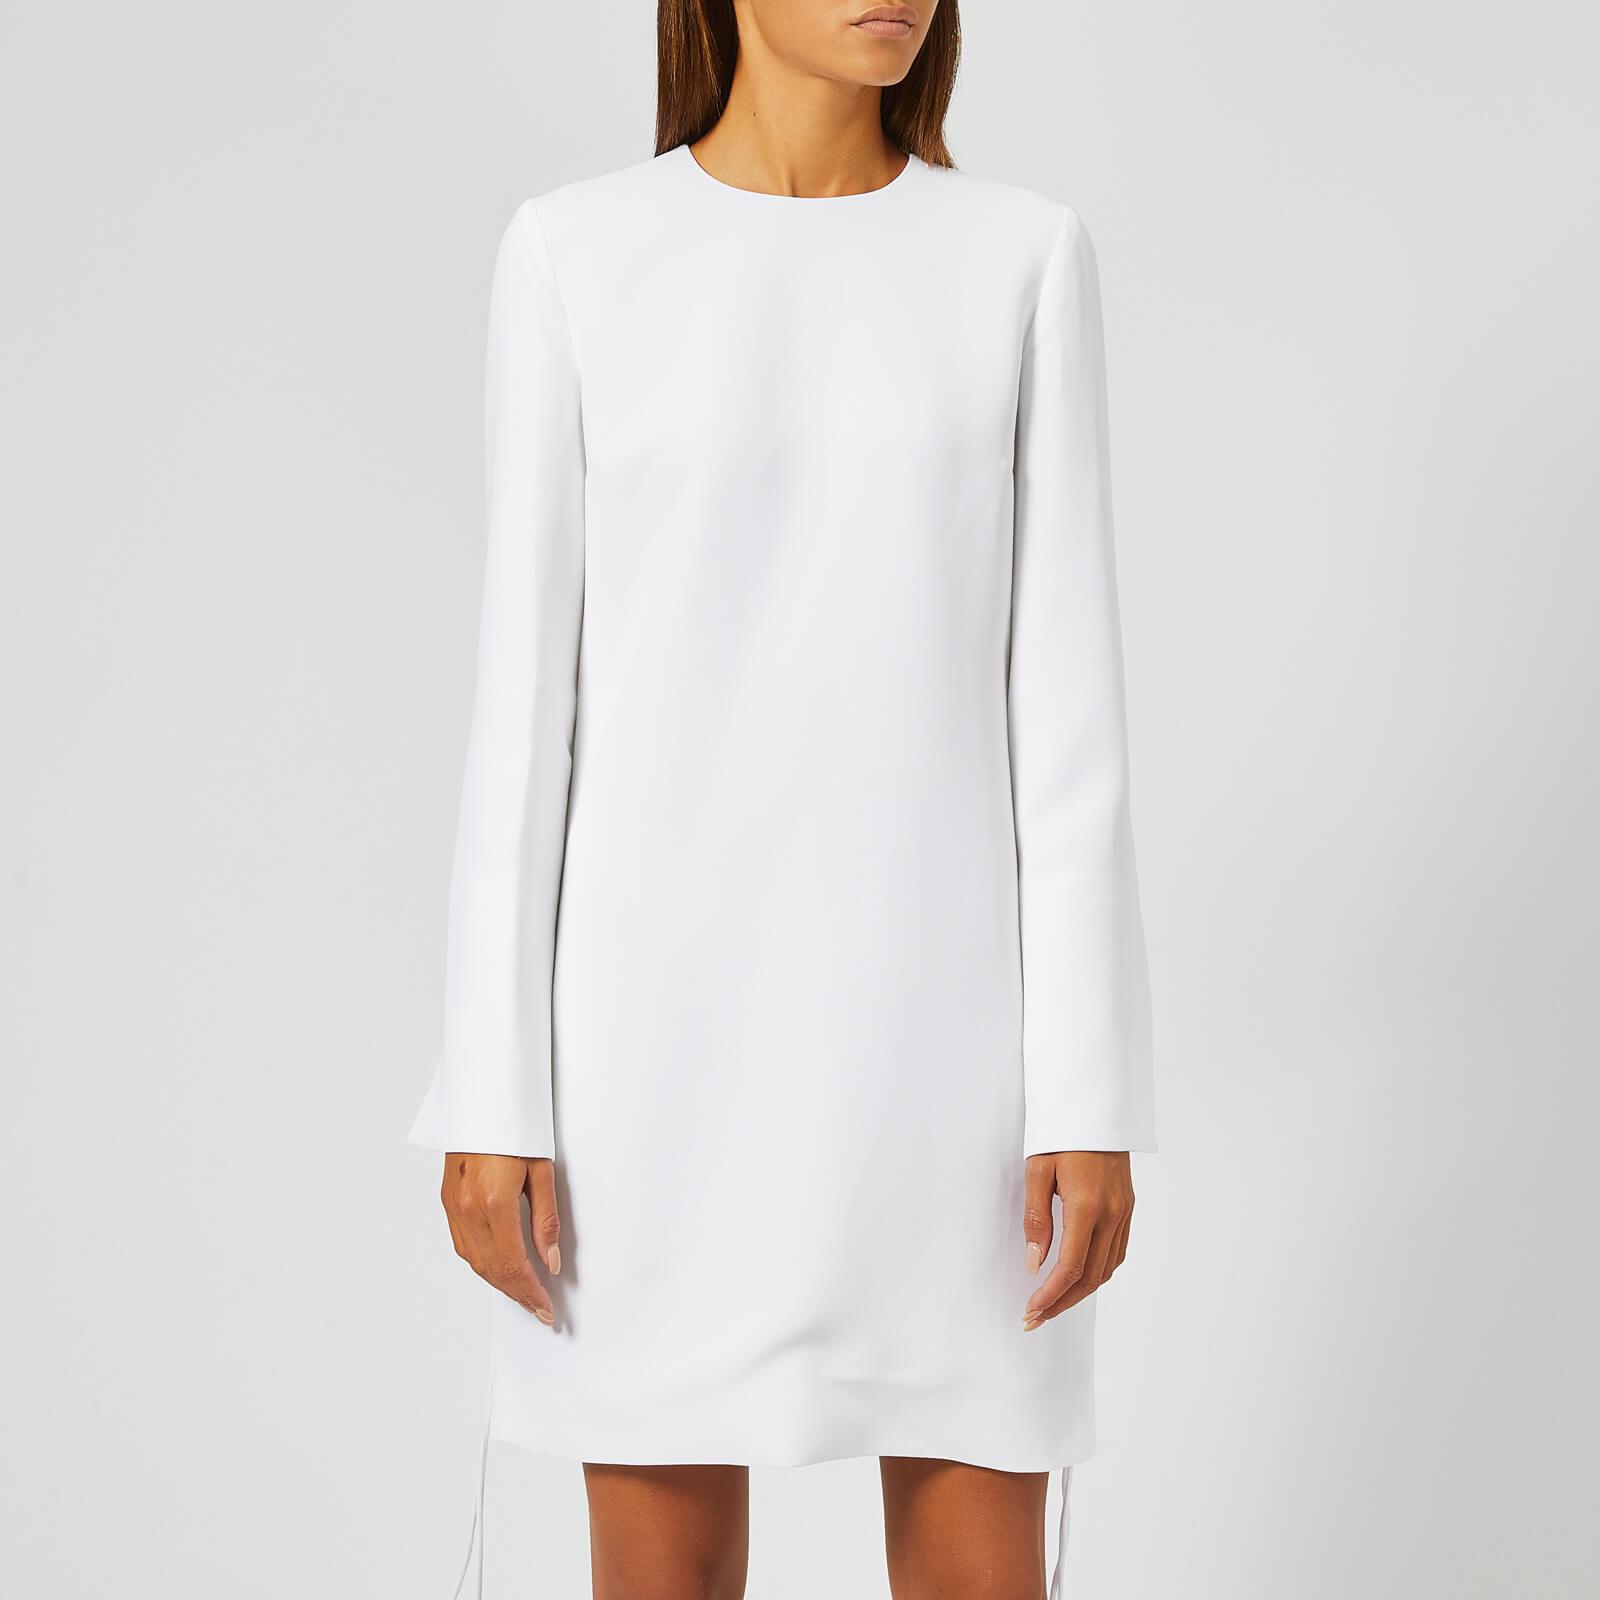 Victoria Victoria Beckham Women S Soft Crepe Tie Cuff Shift Dress White